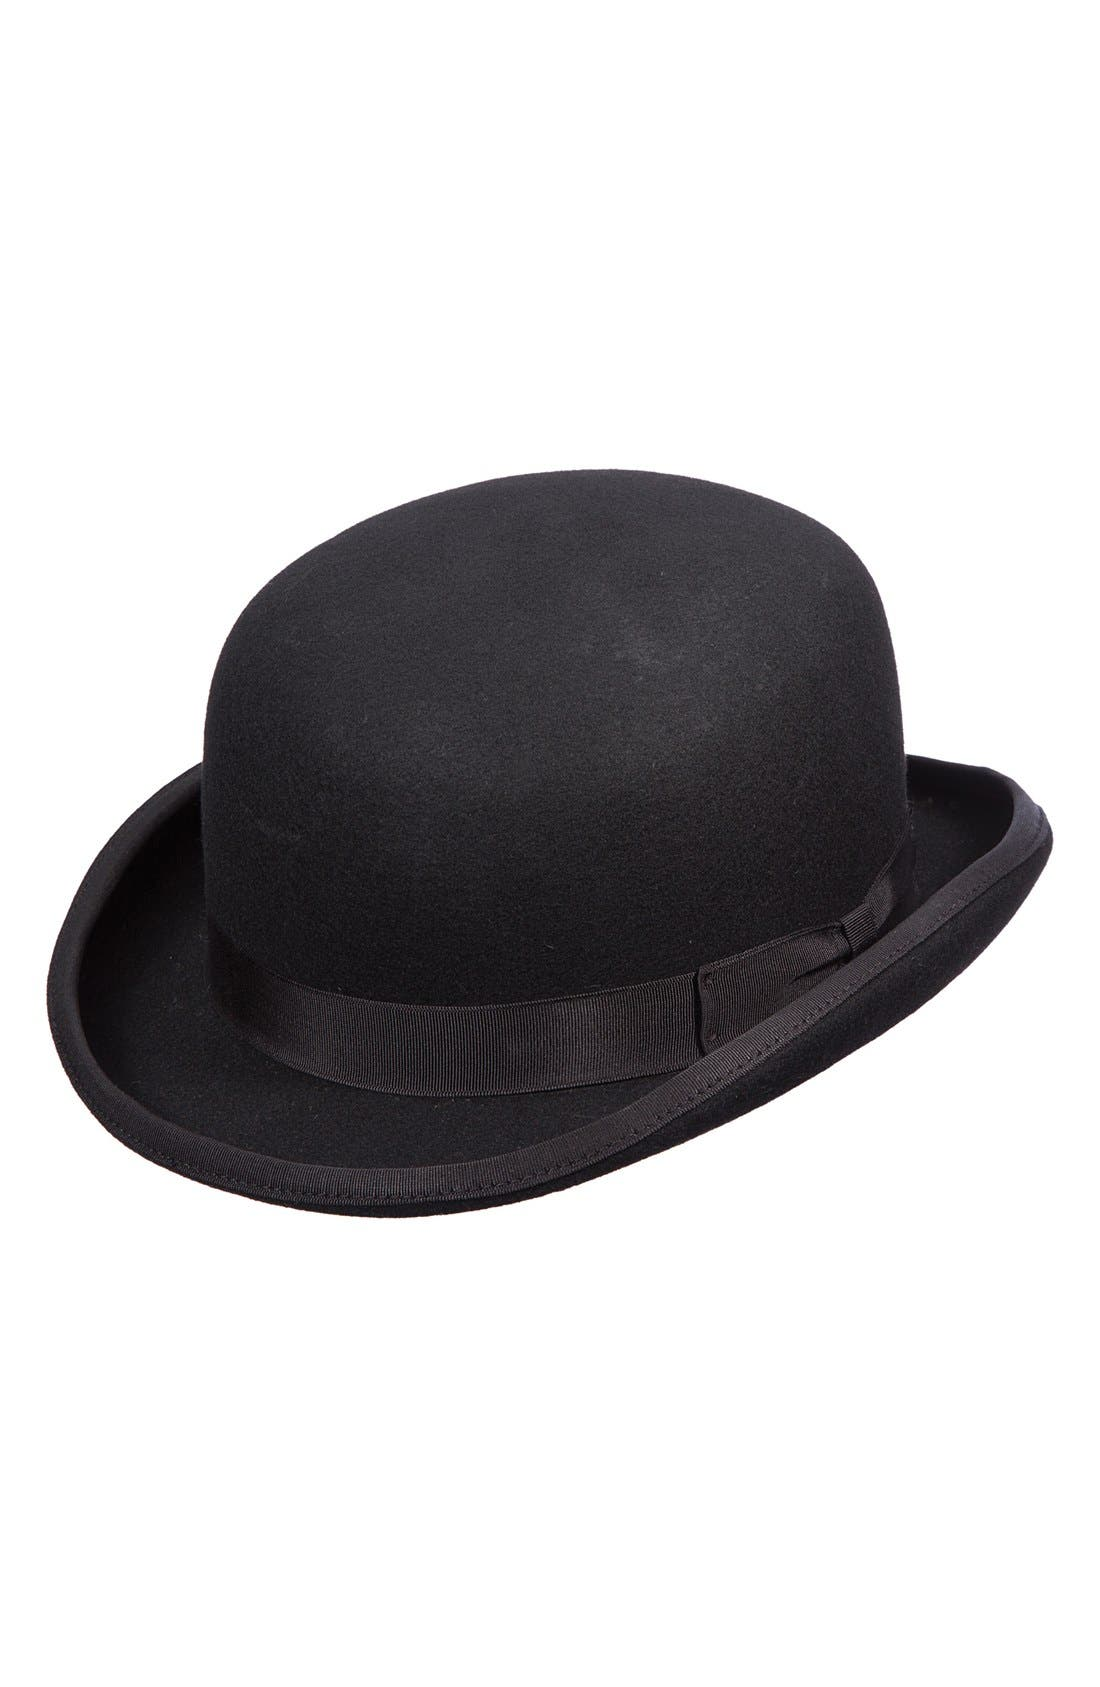 Wool Felt Bowler Hat,                             Main thumbnail 1, color,                             BLACK